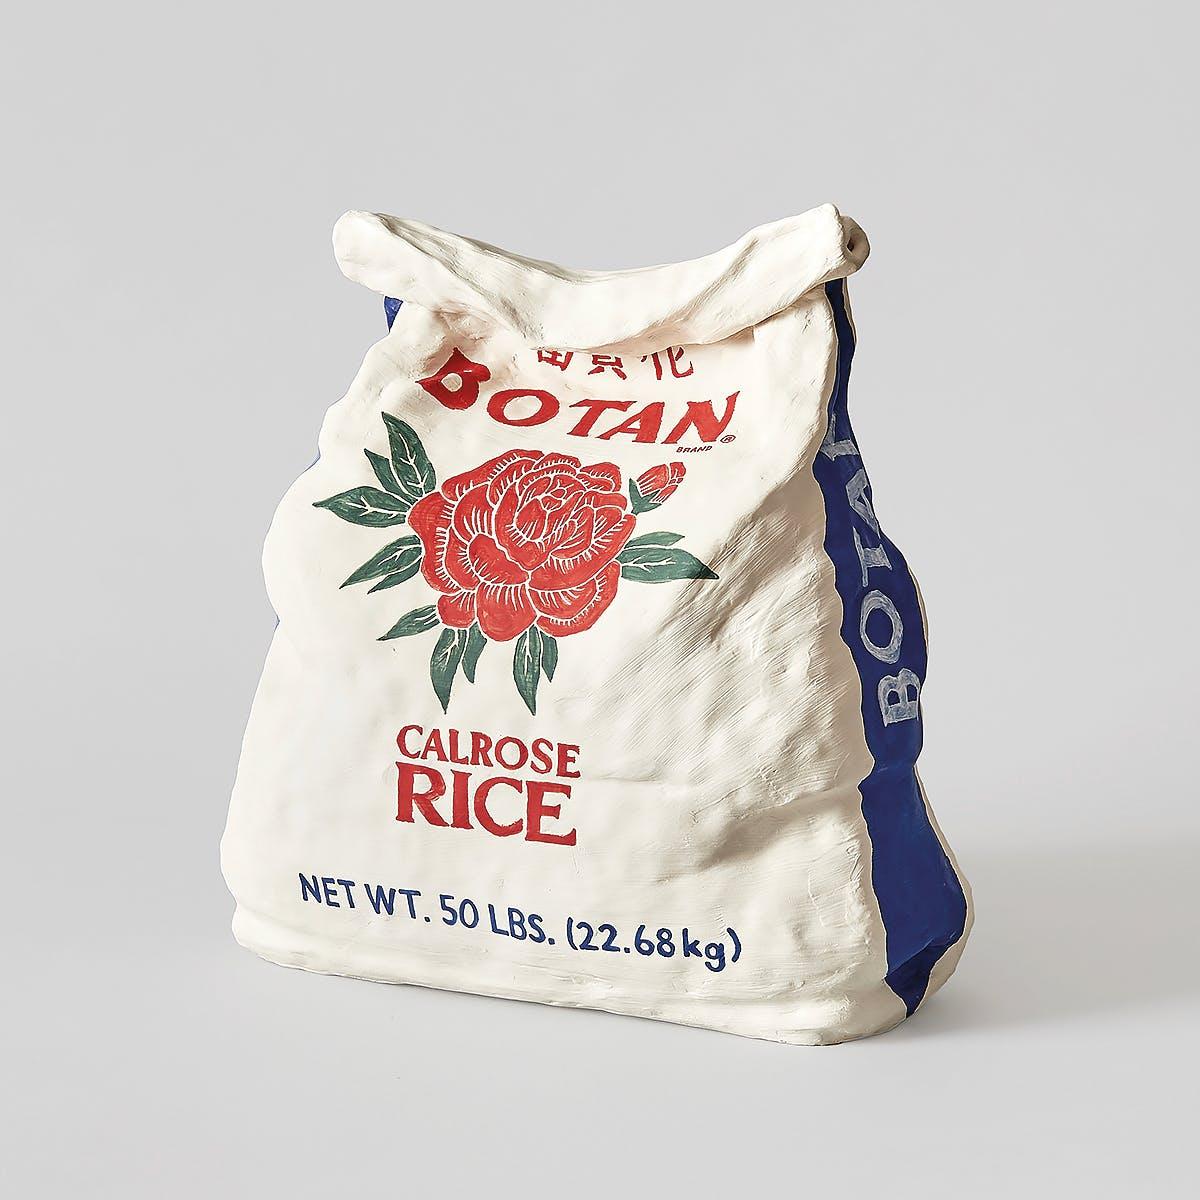 Ceramic replica of Botan Calrose Rice